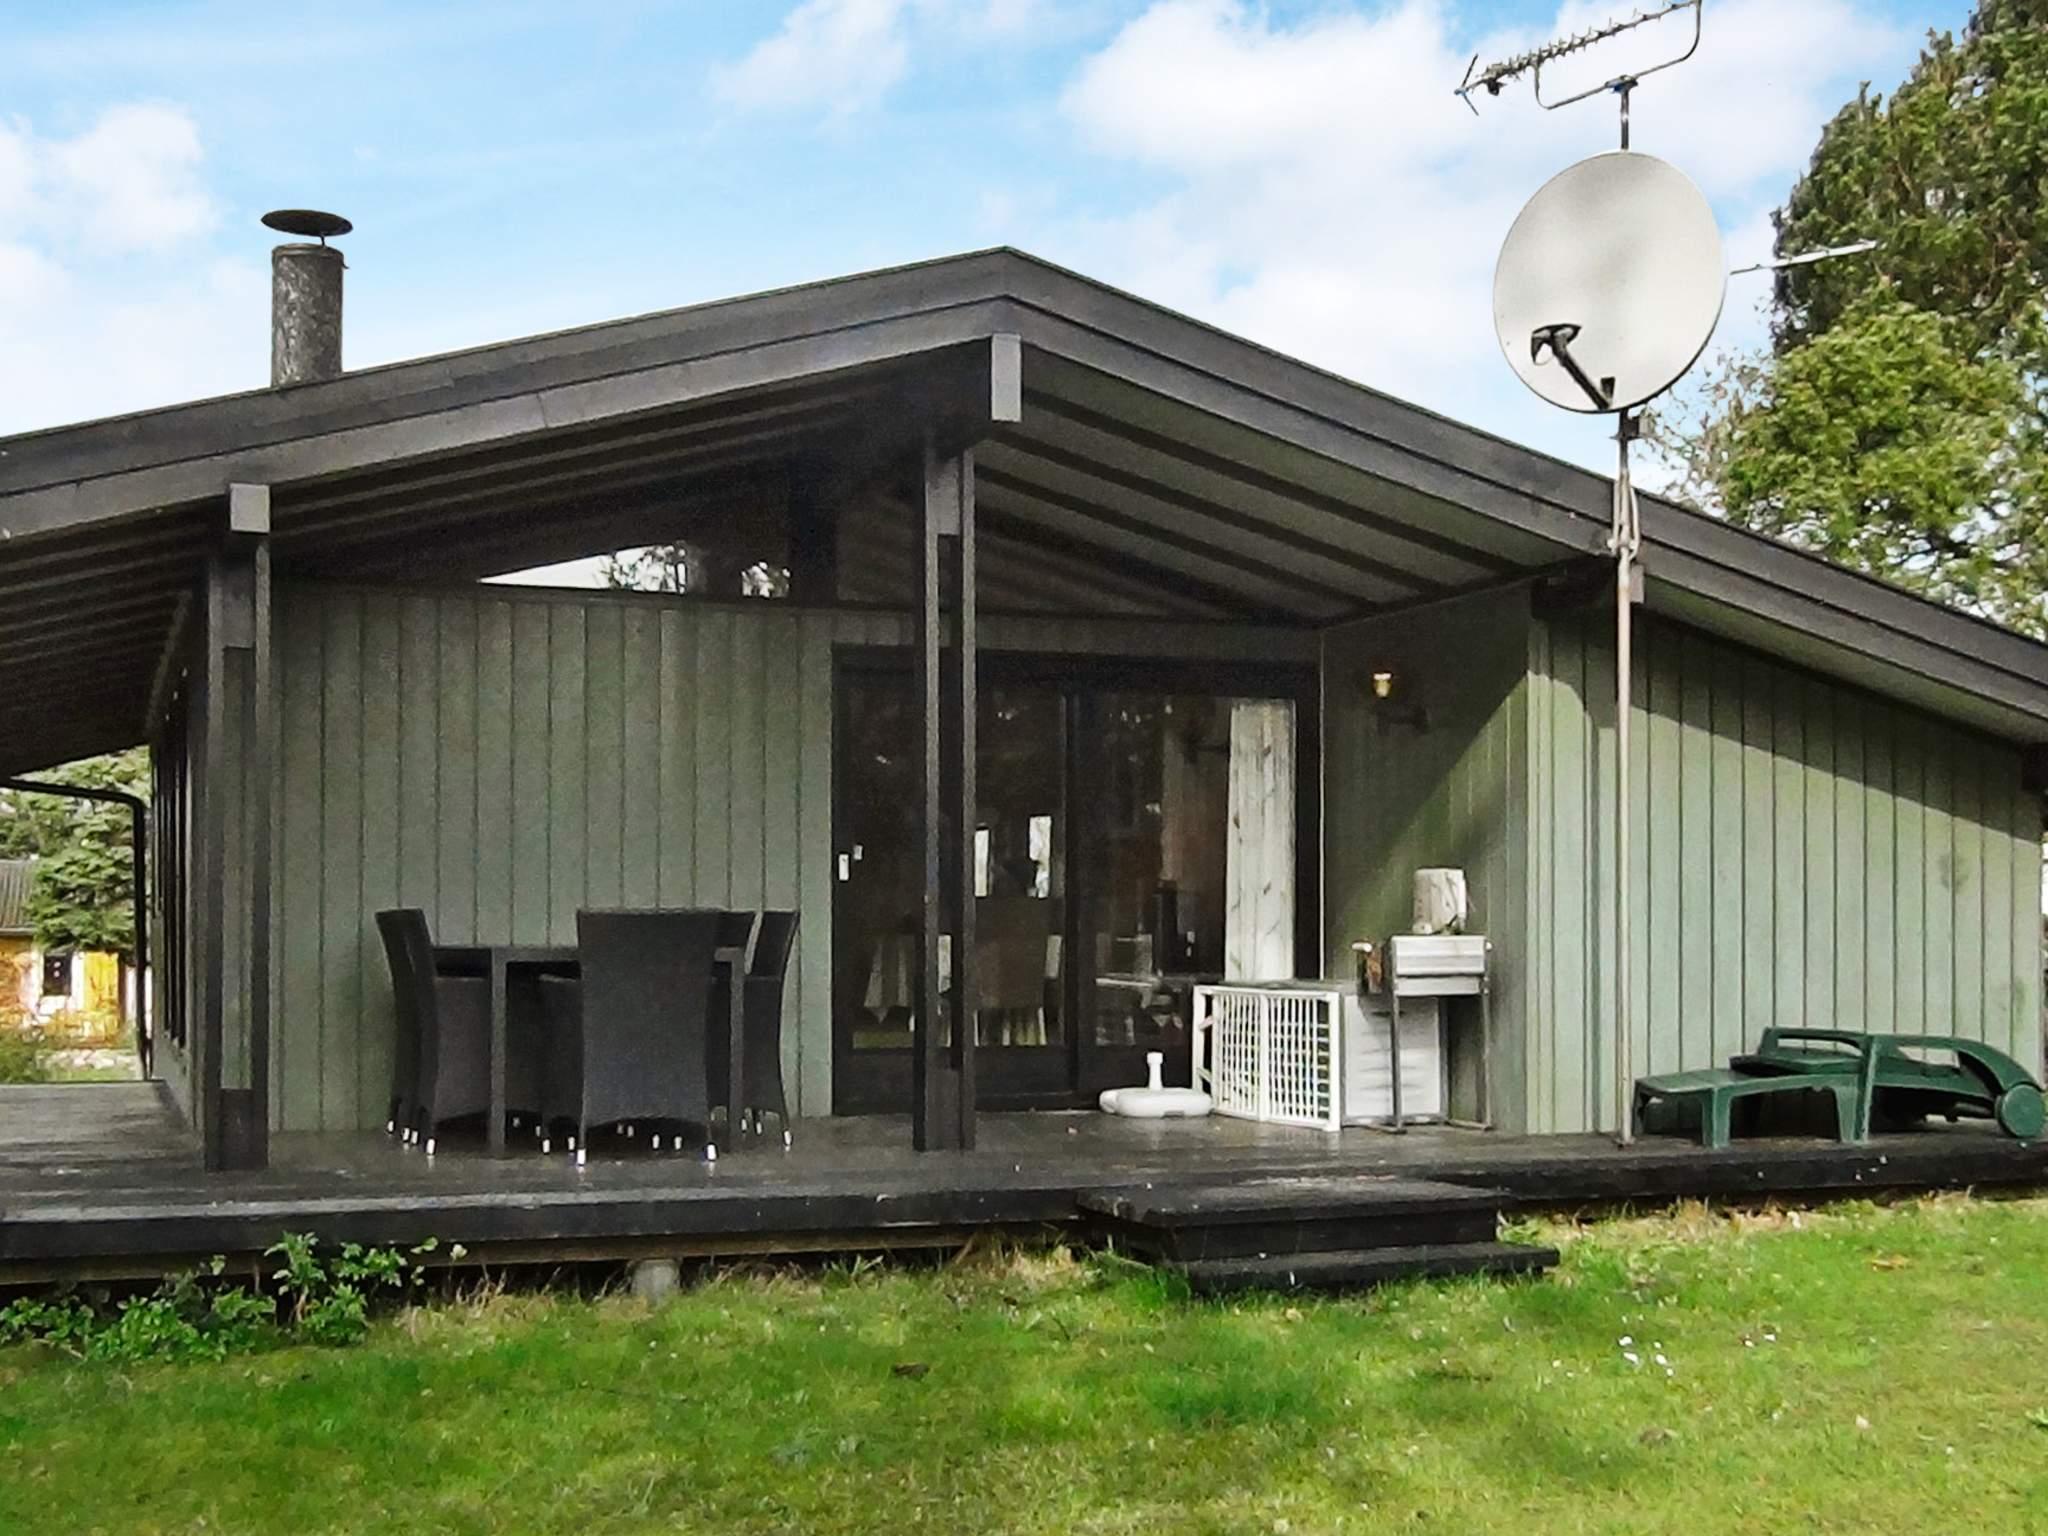 Ferienhaus Hyllingeriis (86362), Skibby, , Nordseeland, Dänemark, Bild 1